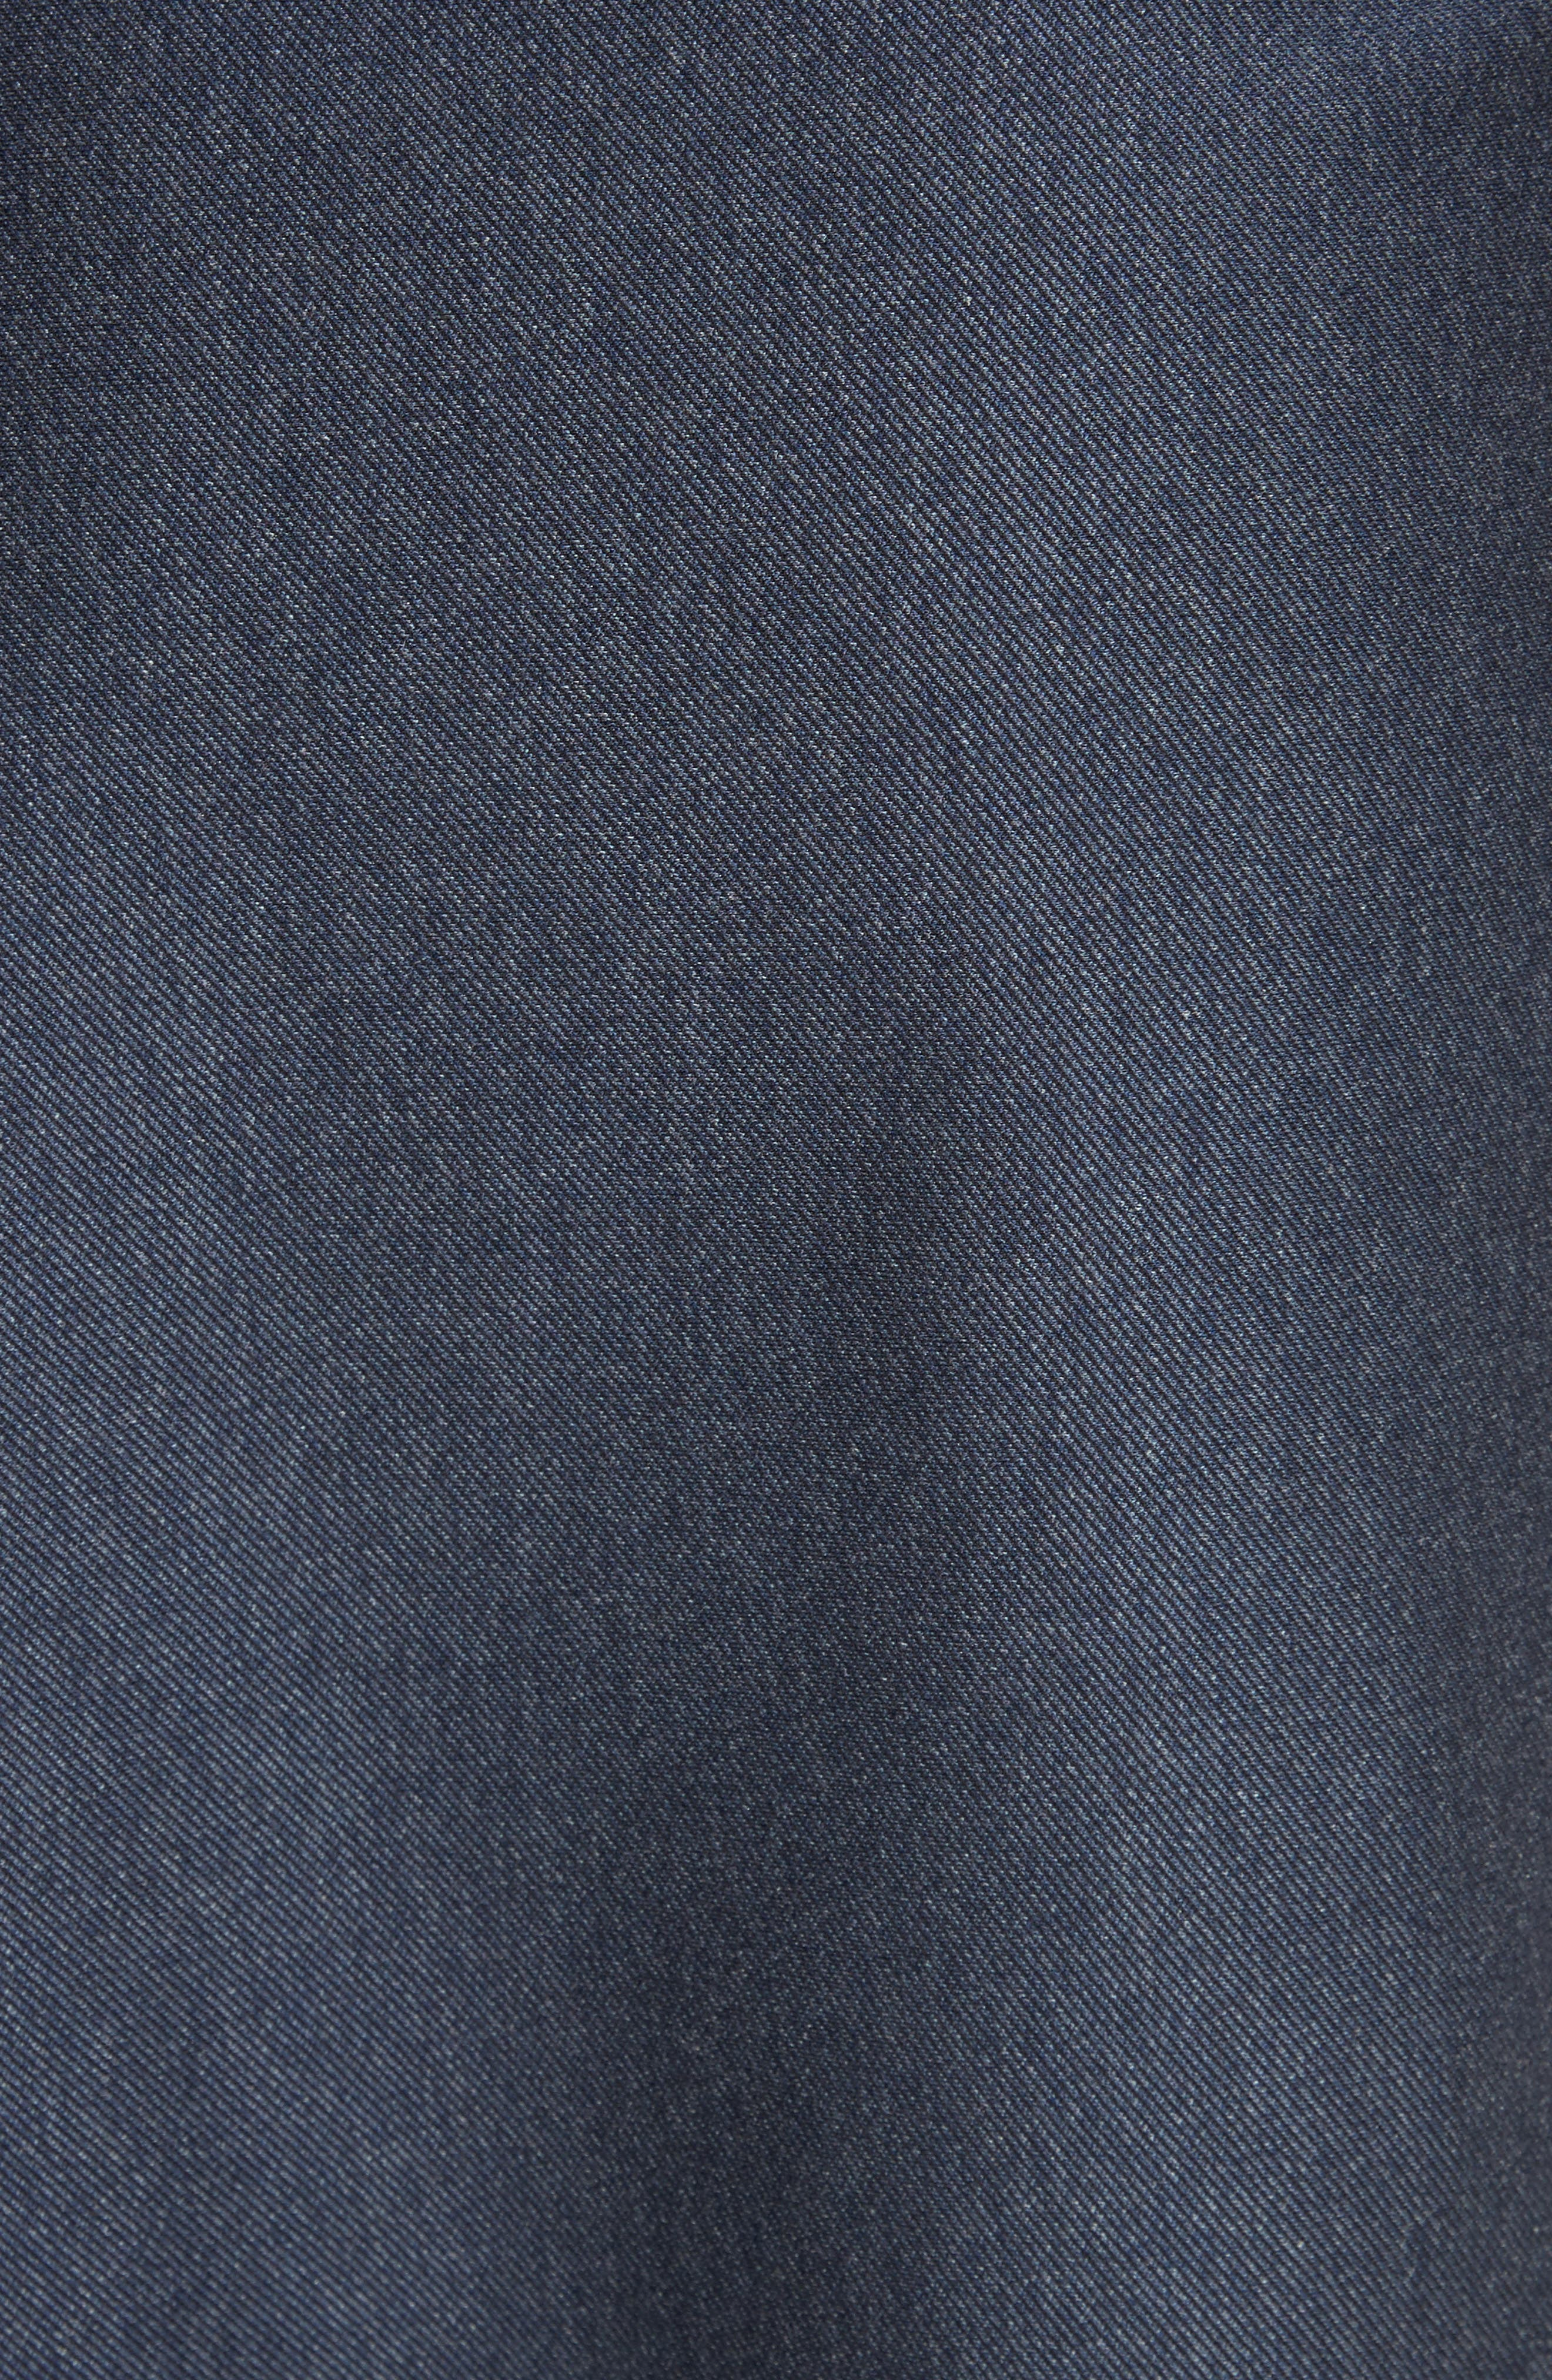 Origami Asymmetrical Twill Skirt,                             Alternate thumbnail 5, color,                             402